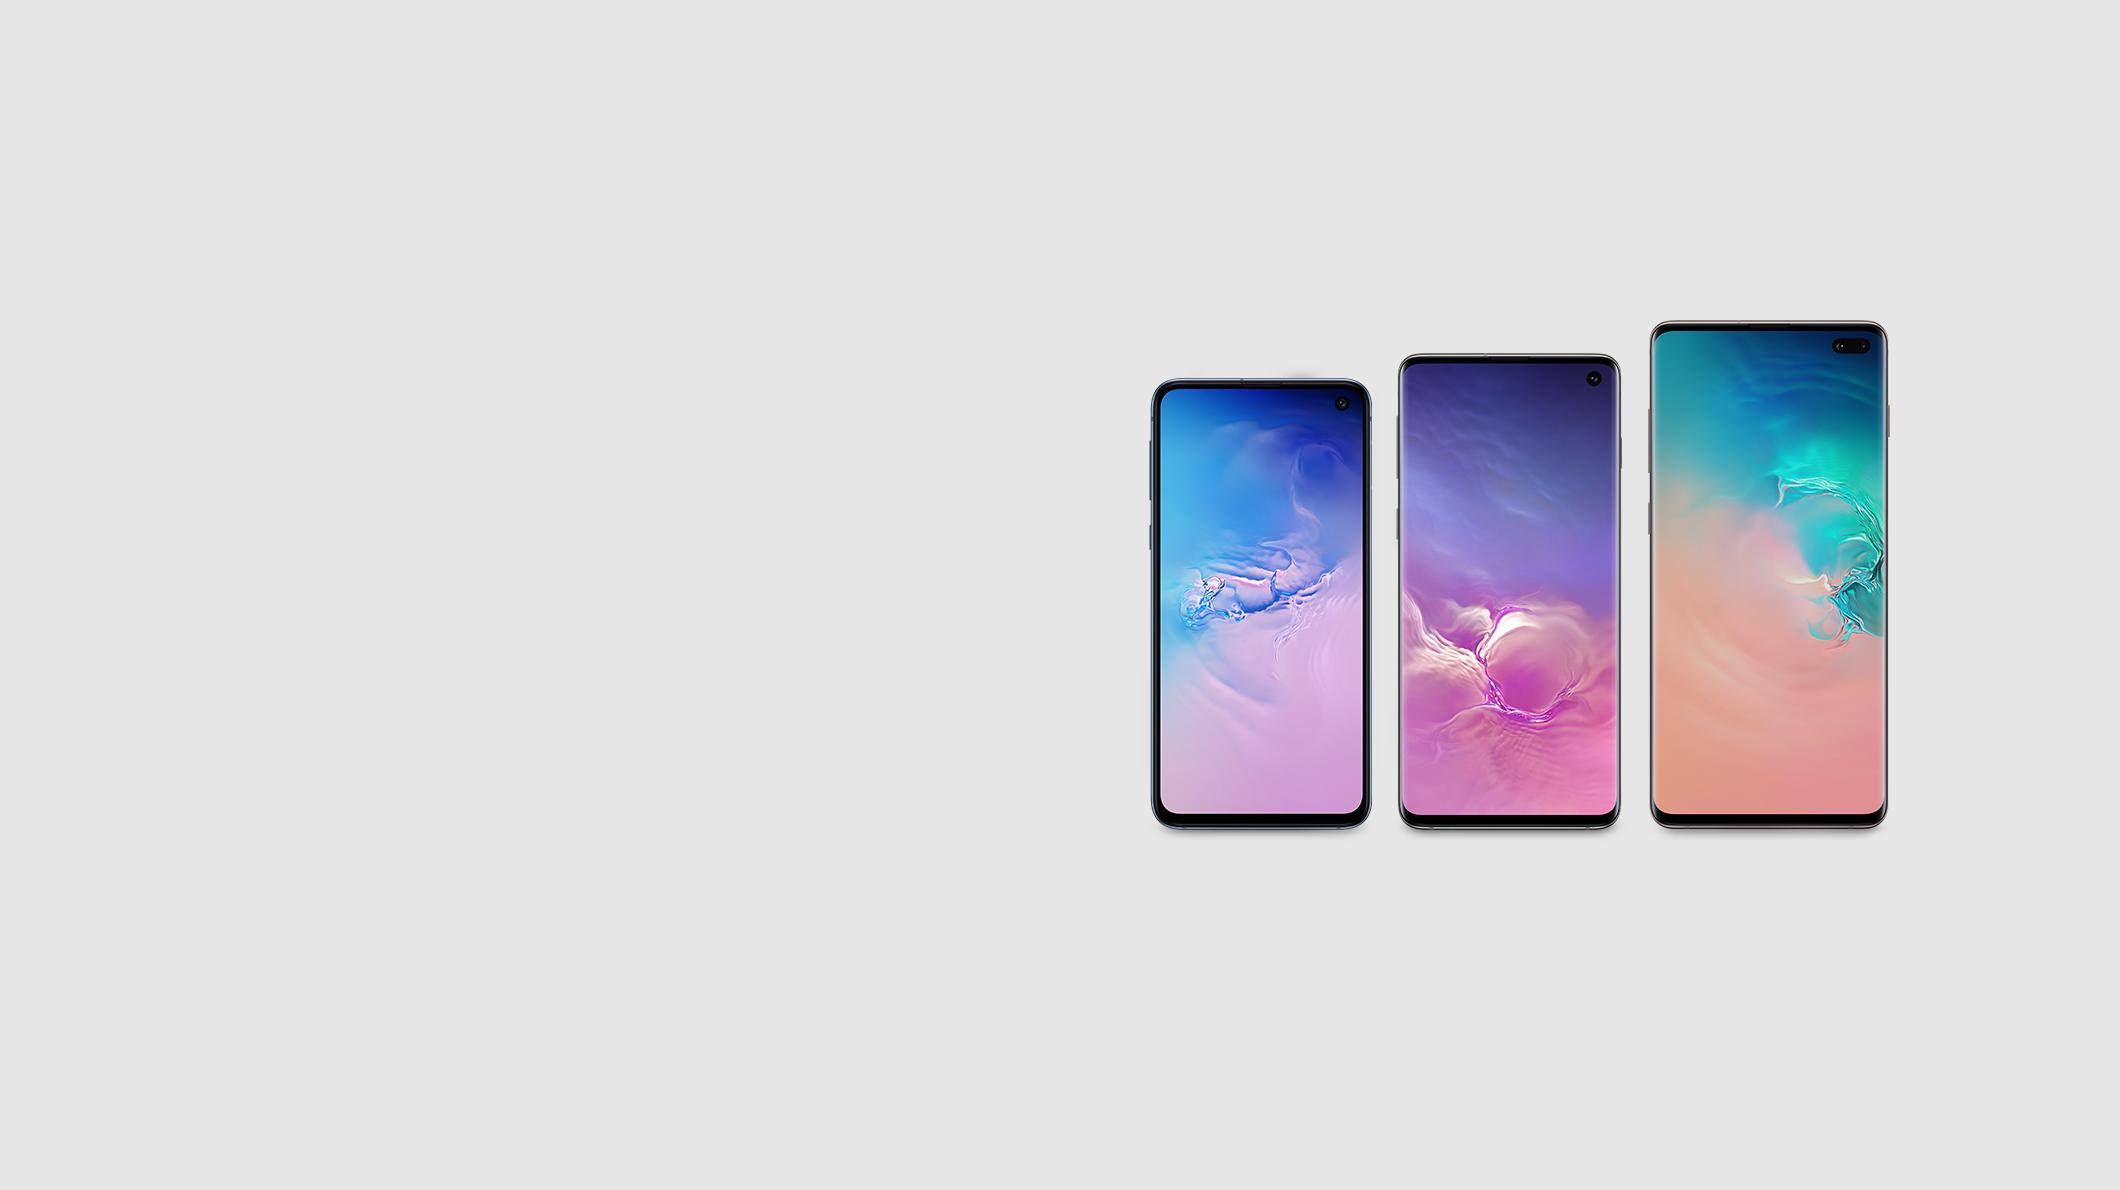 A Samsung Galaxy 10e, 10, and 10+